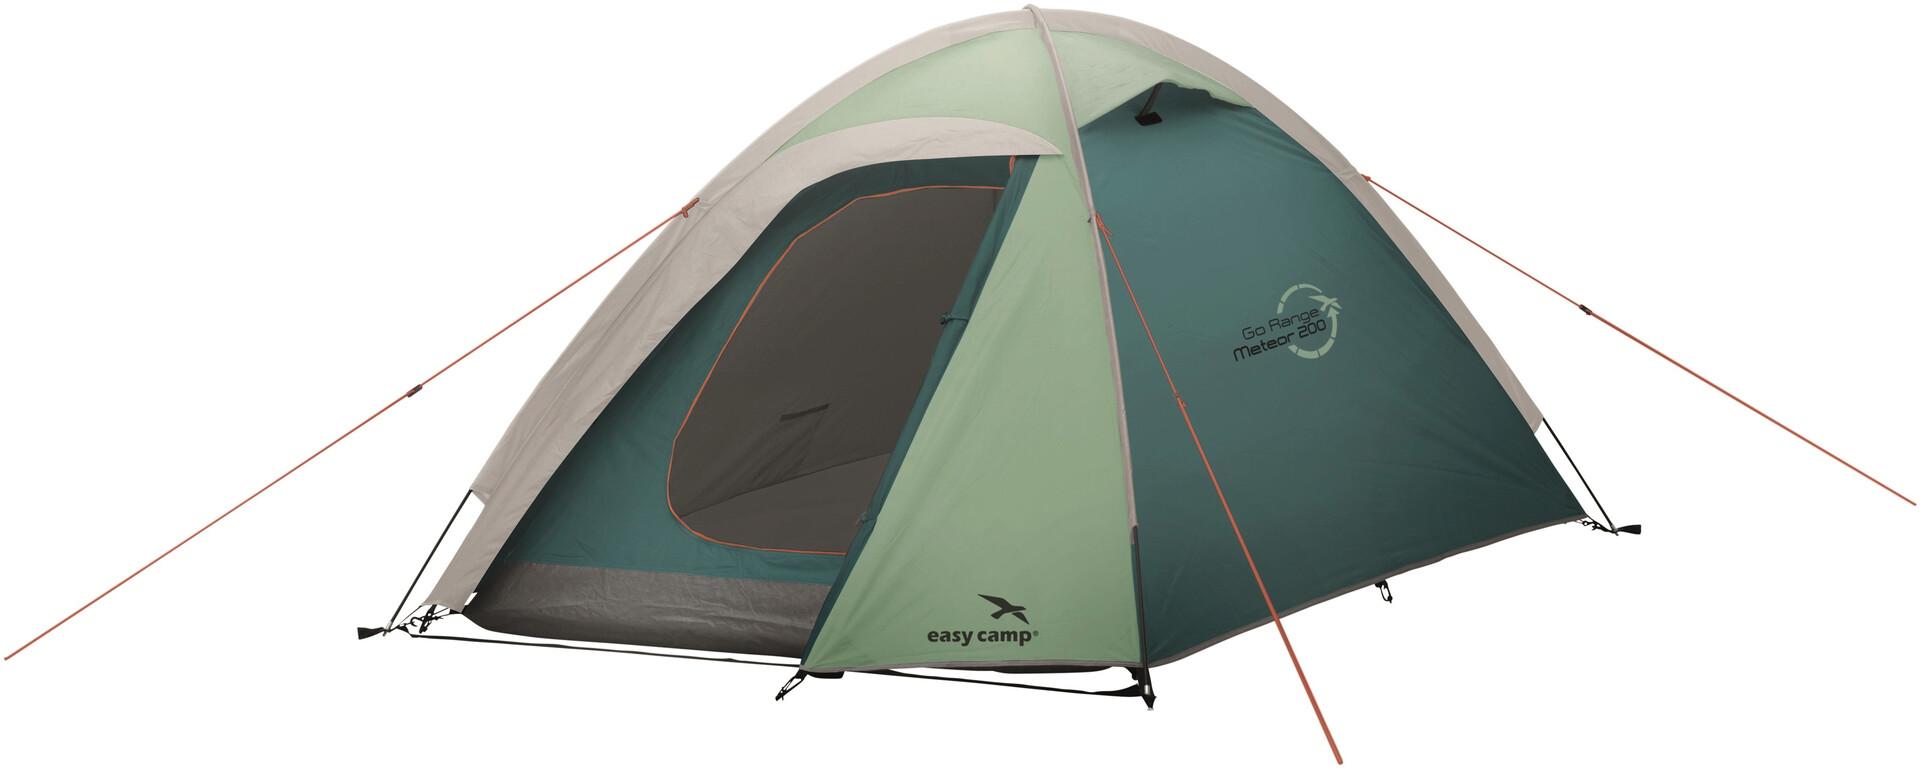 Easy Camp Meteor 200 Tent turquoise | Gode tilbud hos